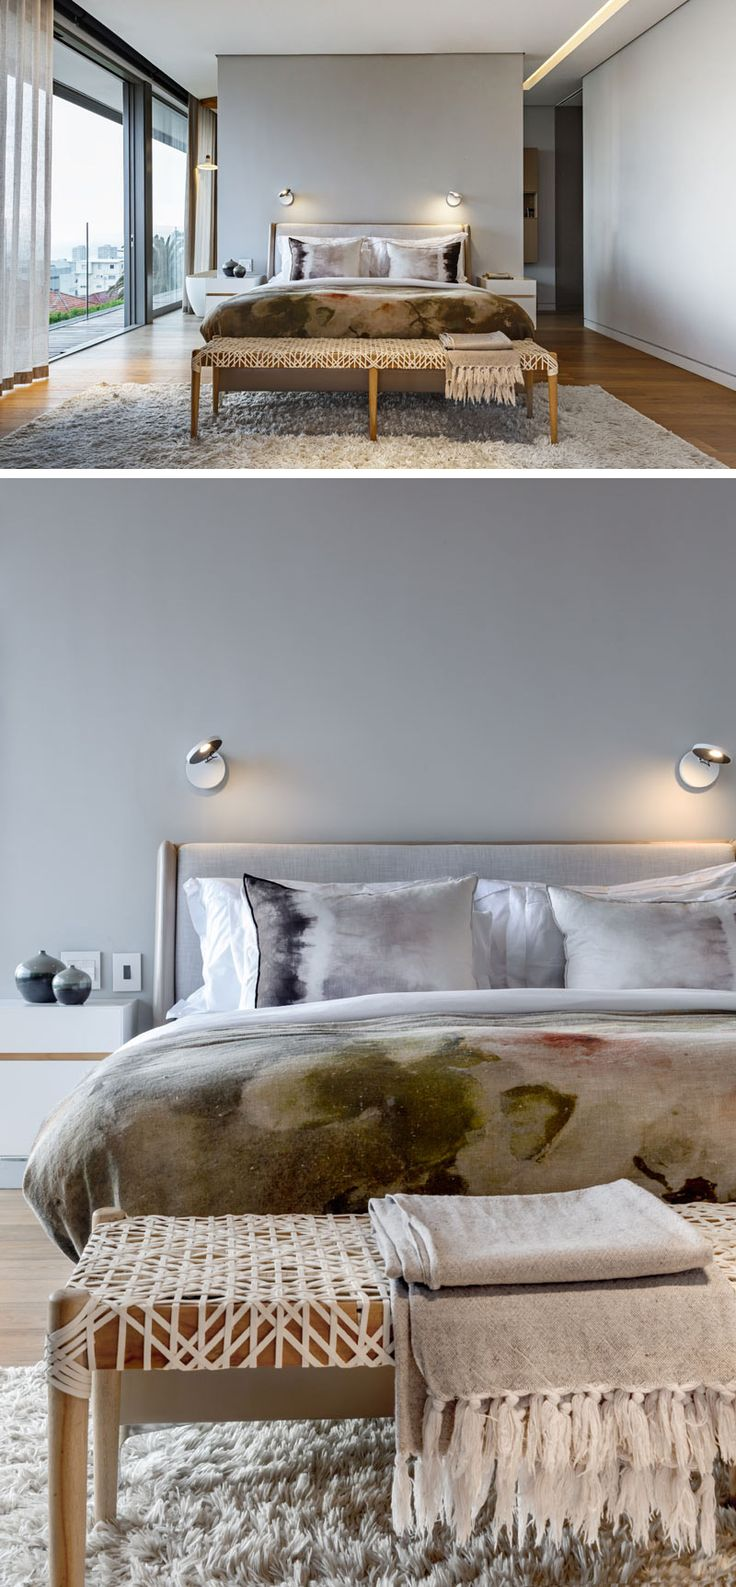 426 best beds hotel bedrooms images on pinterest boutique hotels